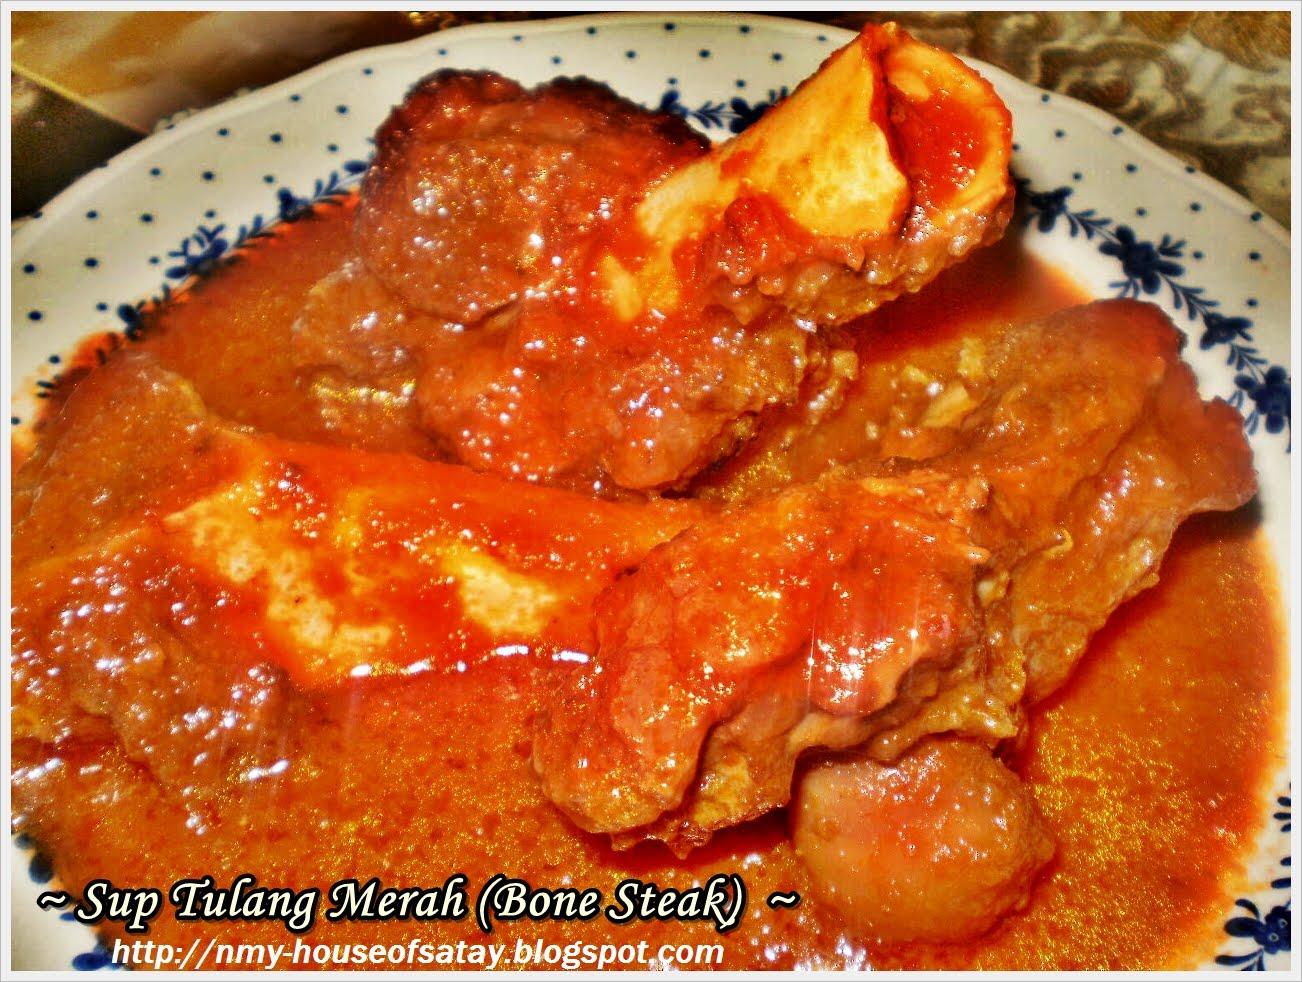 resepi sup tulang merah bone steak bahan2 1 kg tulang lembu tulang